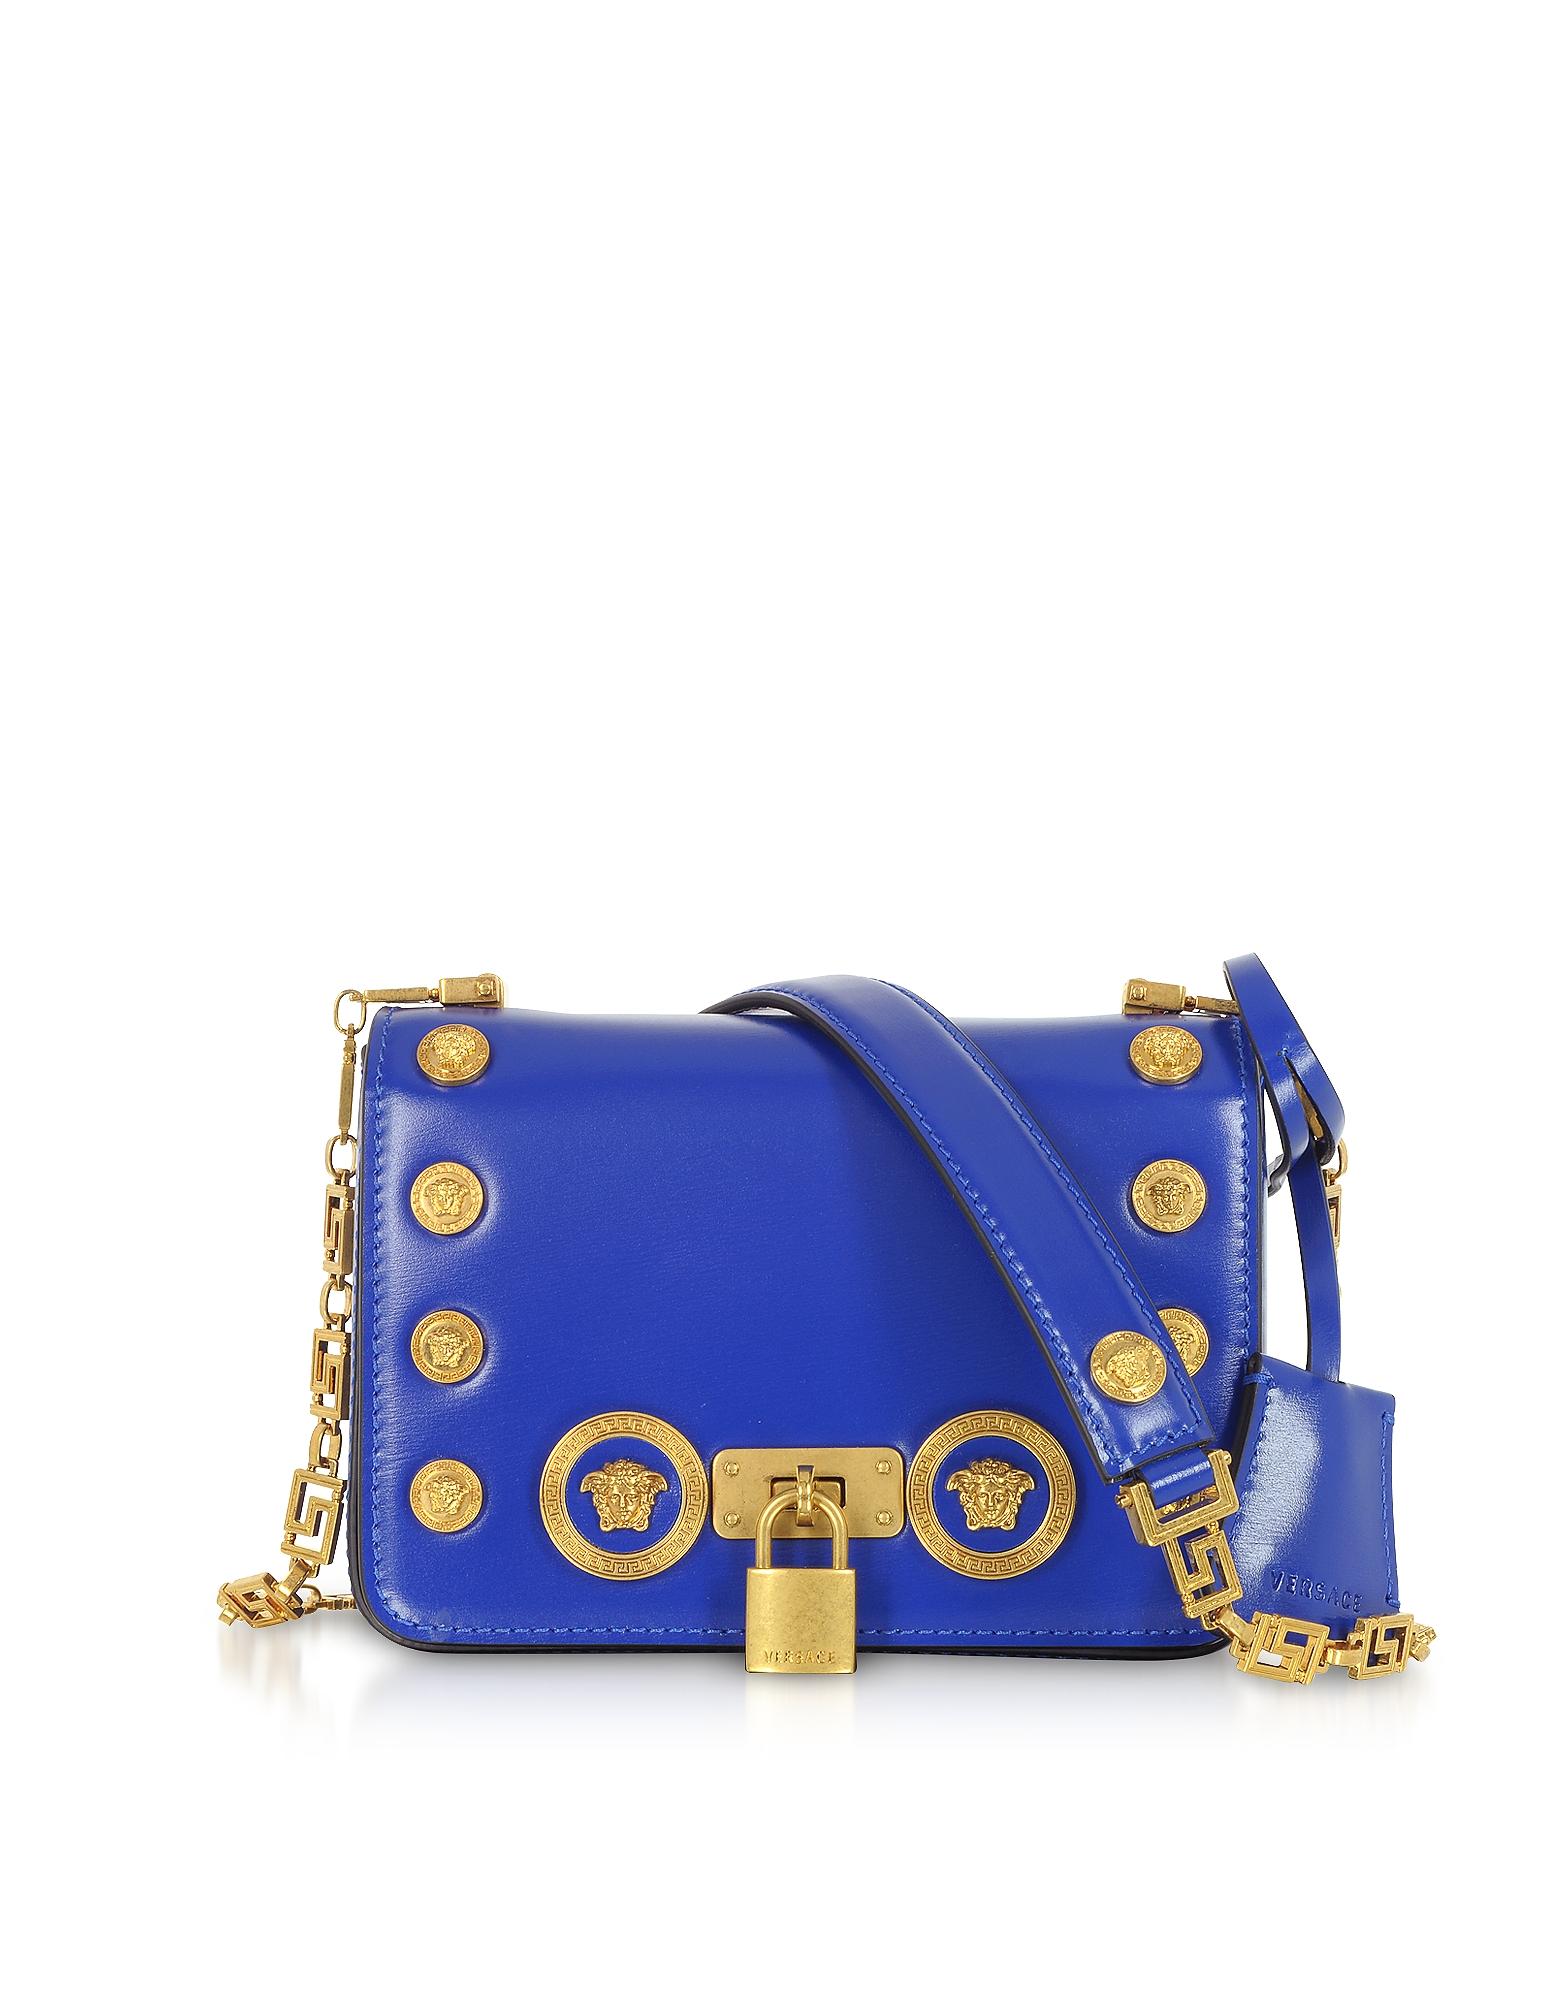 Versace Handbags, Small Icon Leather Shoulder Bag